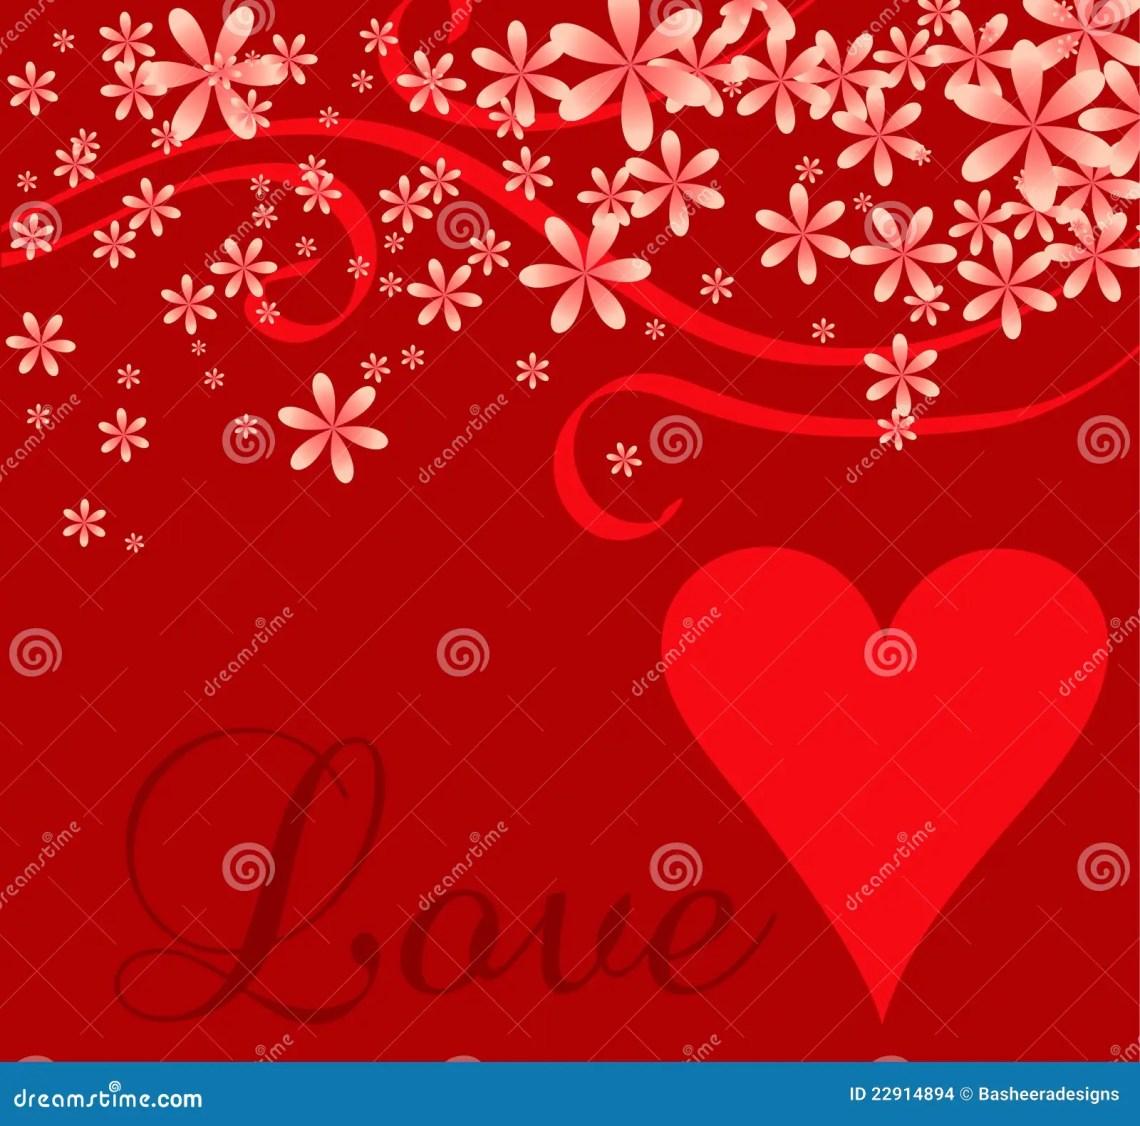 Download Love Heart Cursive Background Stock Vector - Illustration ...